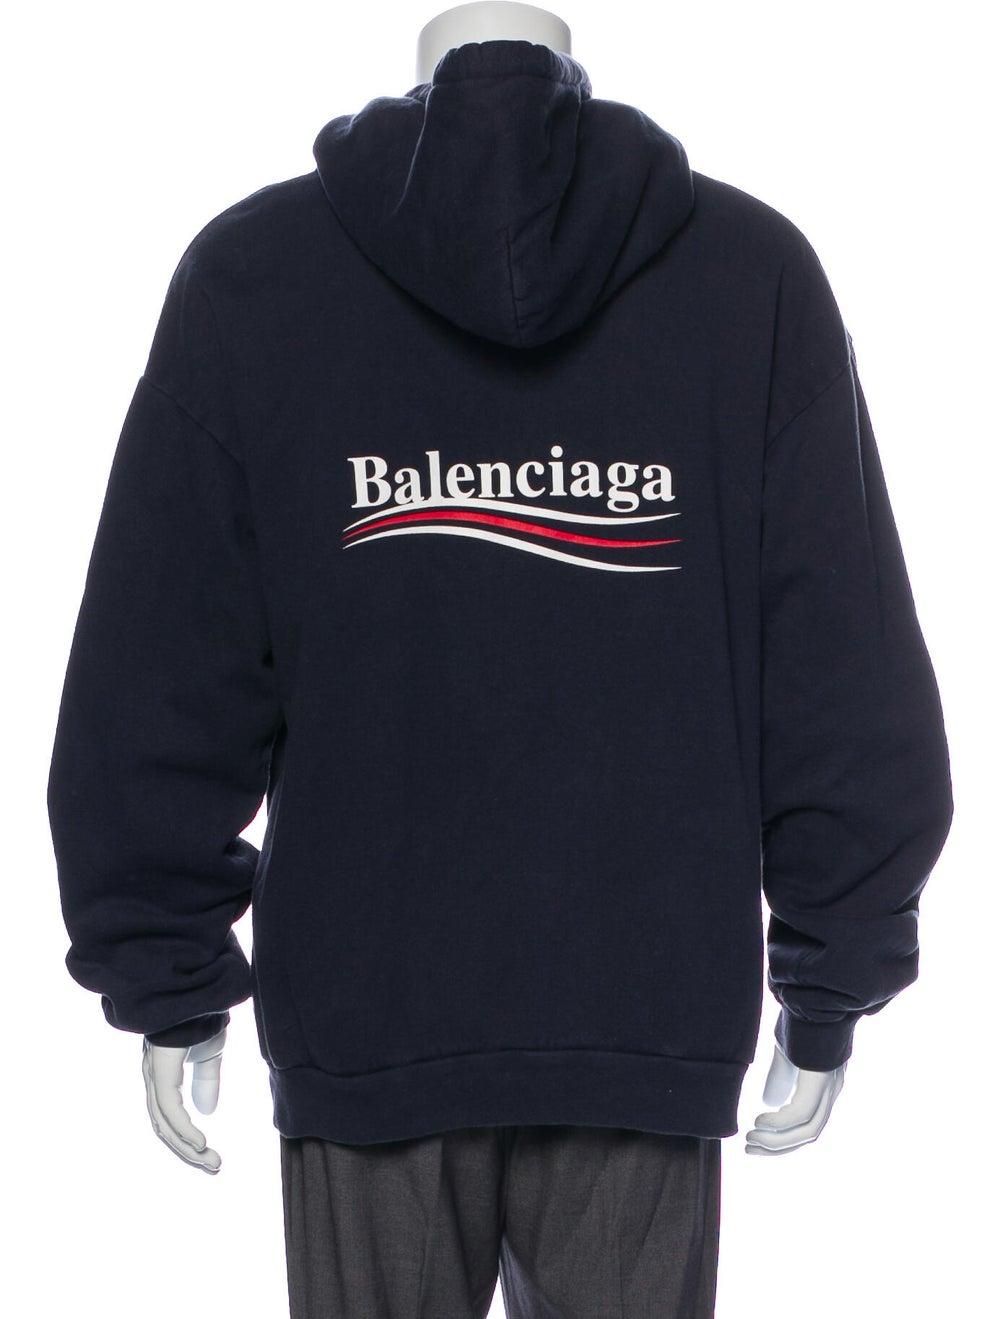 Balenciaga 2018 Graphic Print Hoodie Blue - image 3